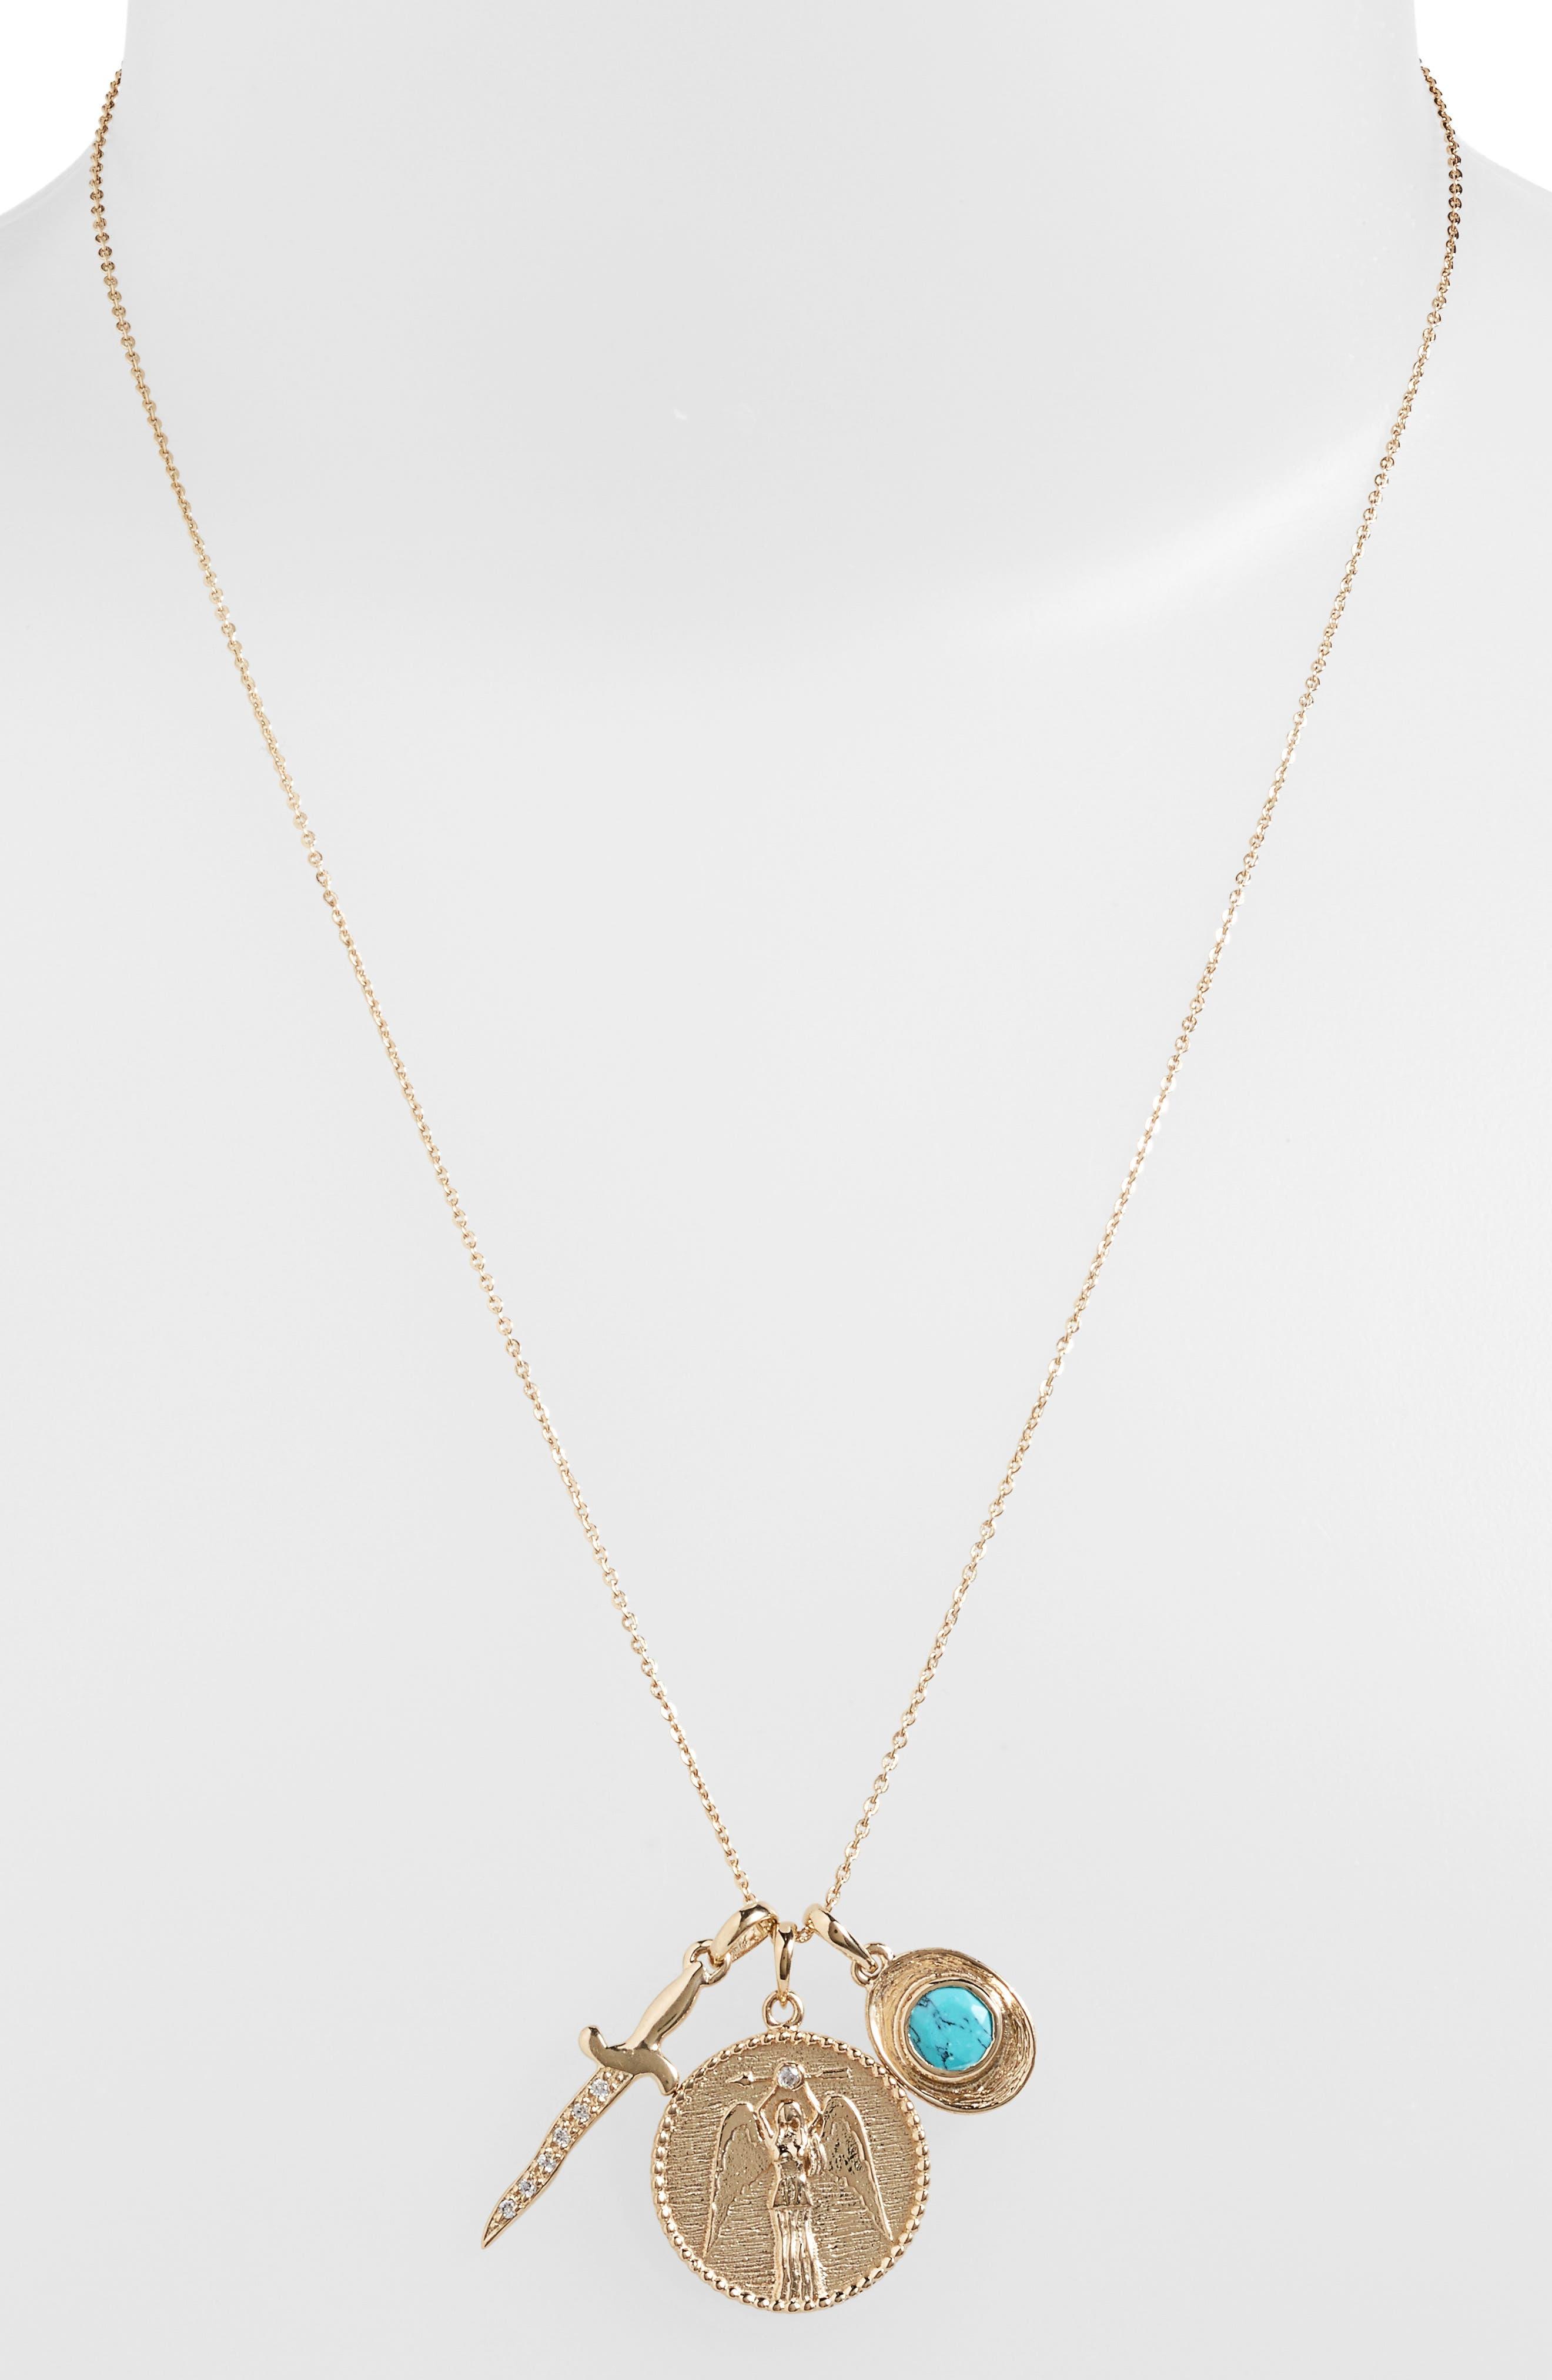 Main Image - Melinda Maria Goddess of Strength Cluster Pendant Necklace